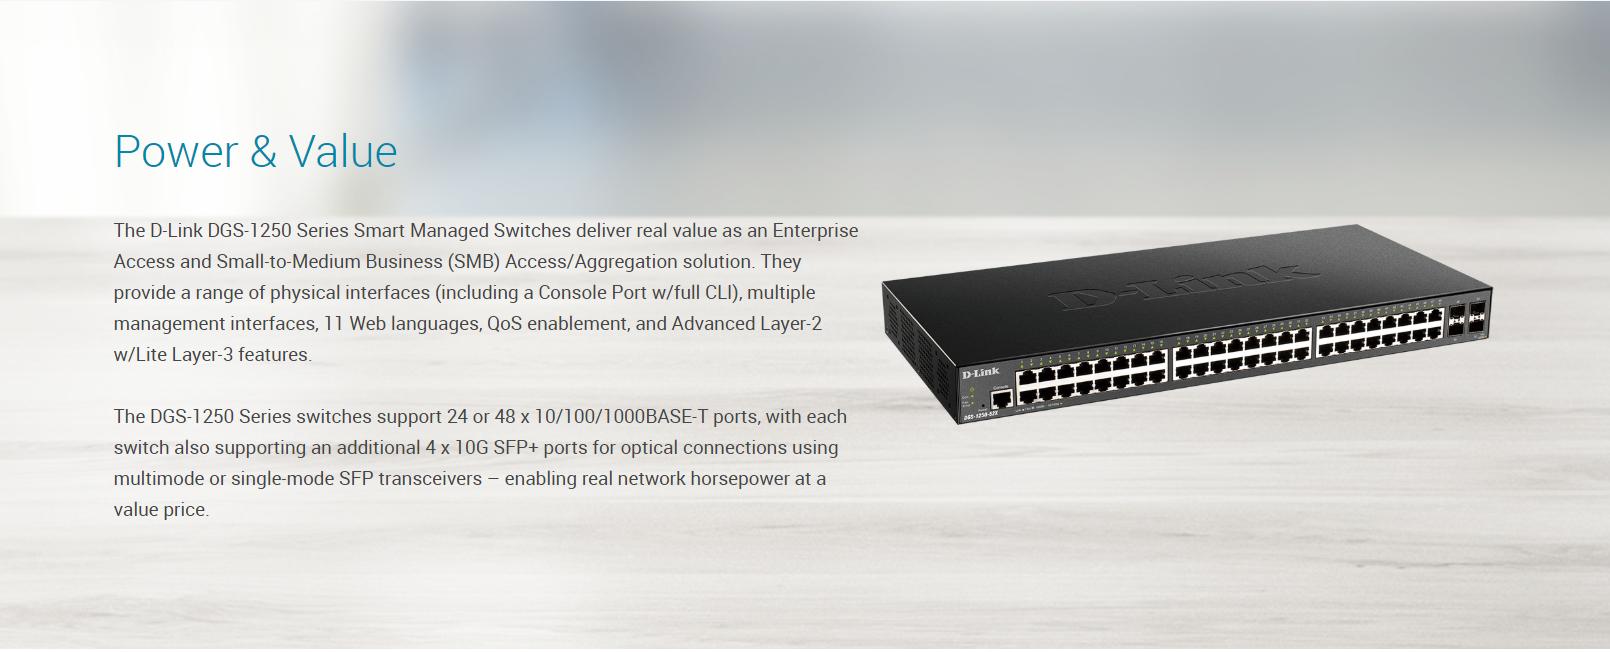 52-Port 10-Gigabit Smart Managed Switch - D-Link Vietnam